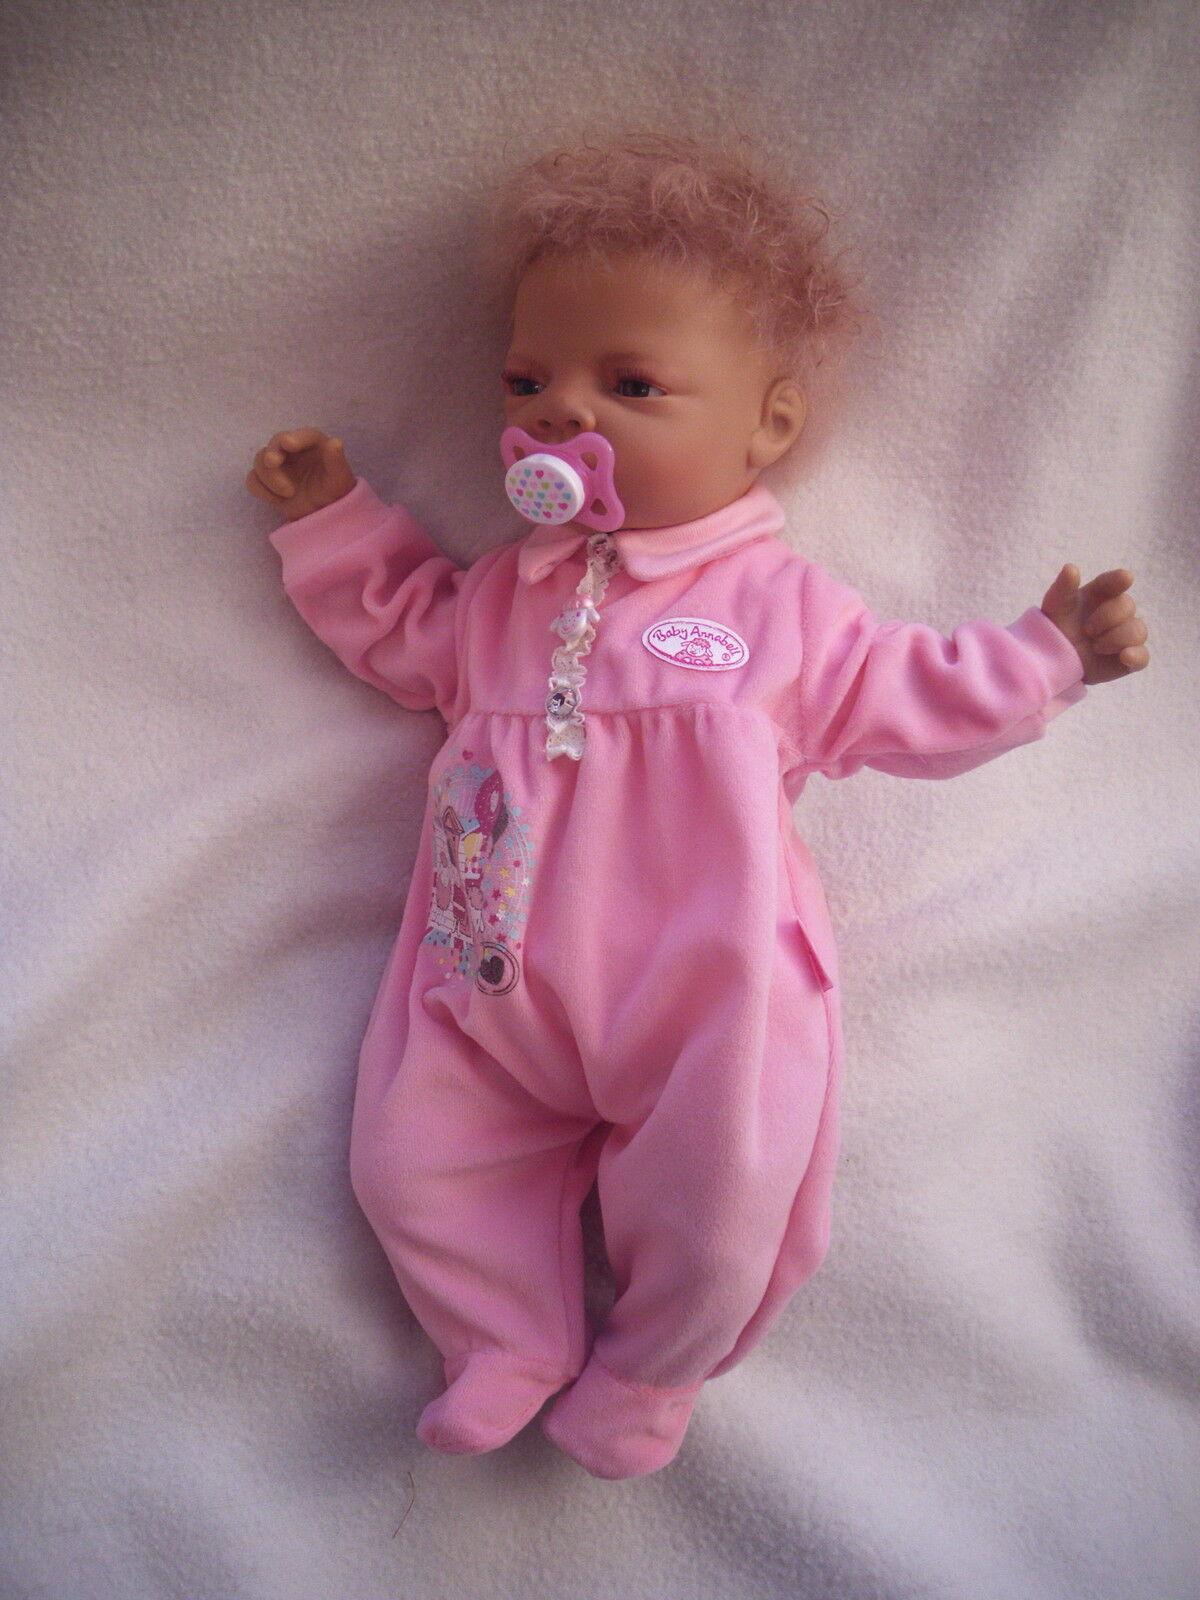 Reborn Puppe Puppe Puppe Rebornpuppe Rebornbaby Sammlerpuppe Puppenbaby Babypuppe 806227